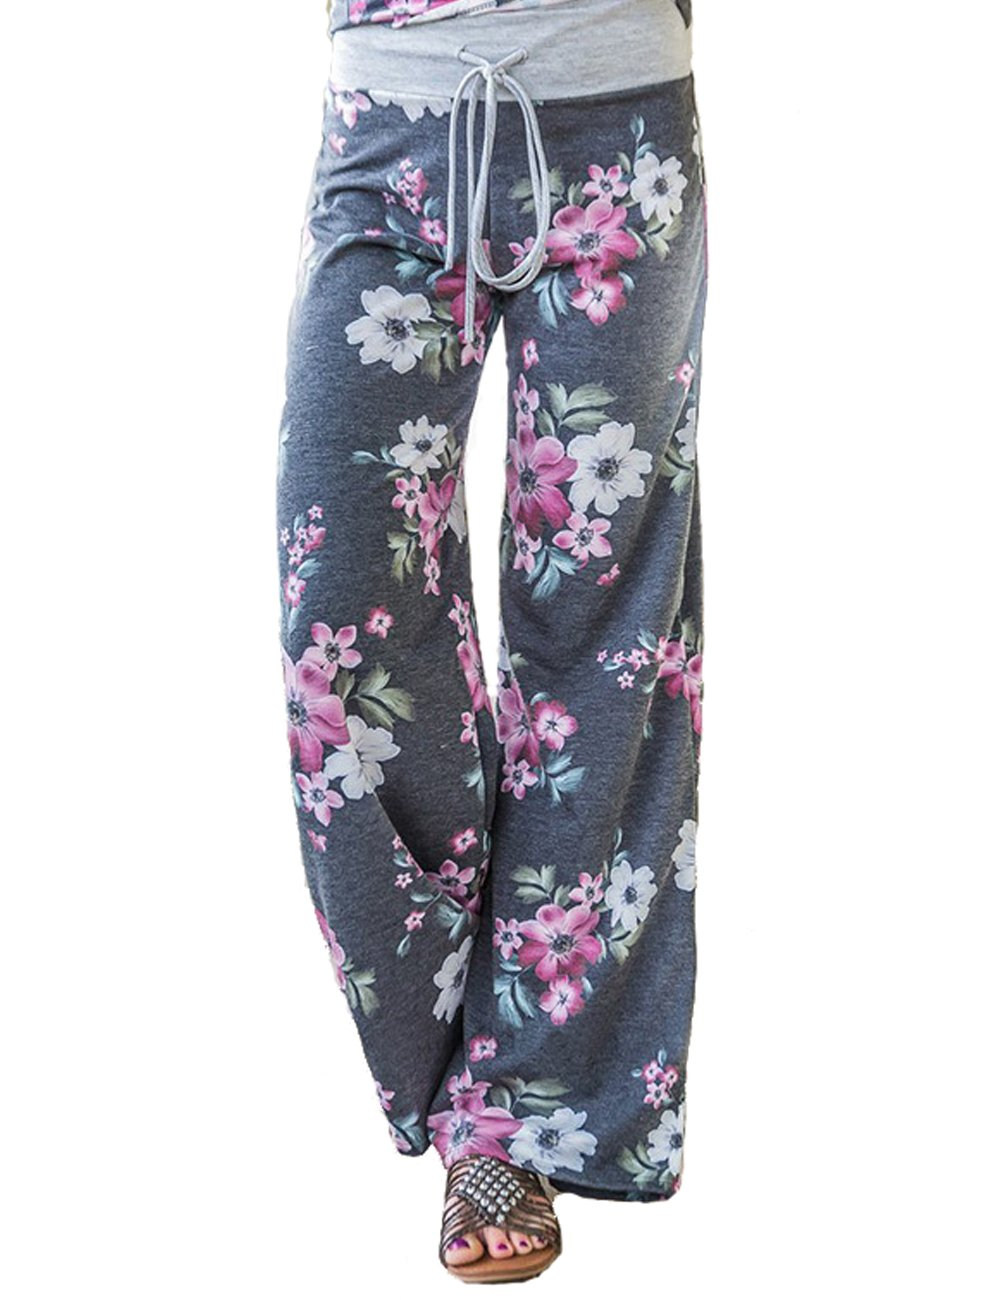 Assivia Women's Casual Pajama Pants Floral Drawstring Wide Leg High Waist Palazzo Lounge Pants (L, Grey5)